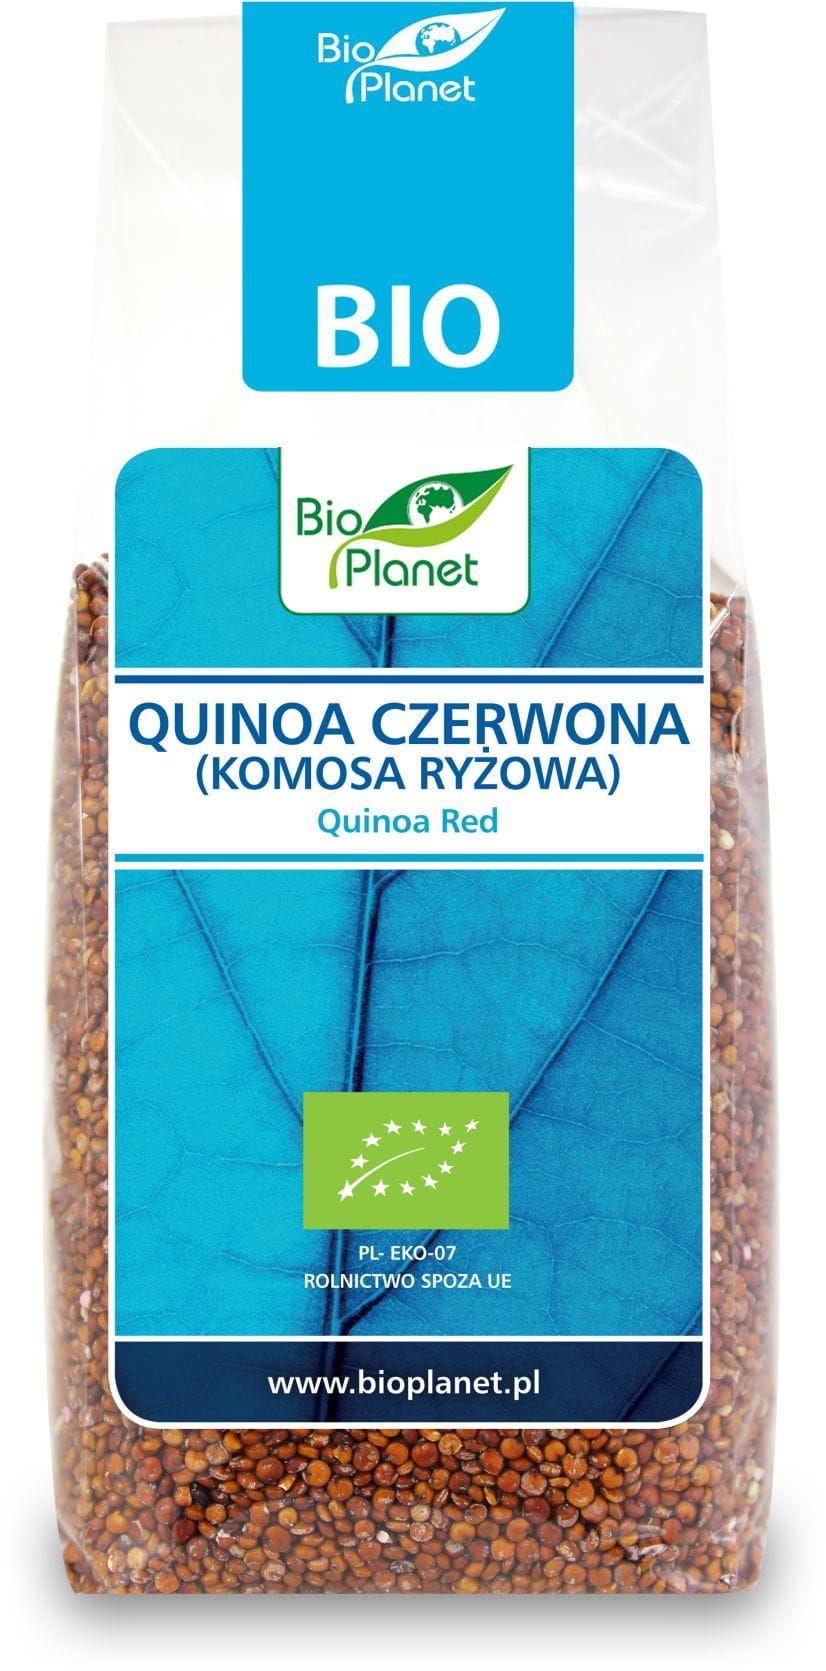 Quinoa czerwona komosa ryżowa bio 250 g - bio planet